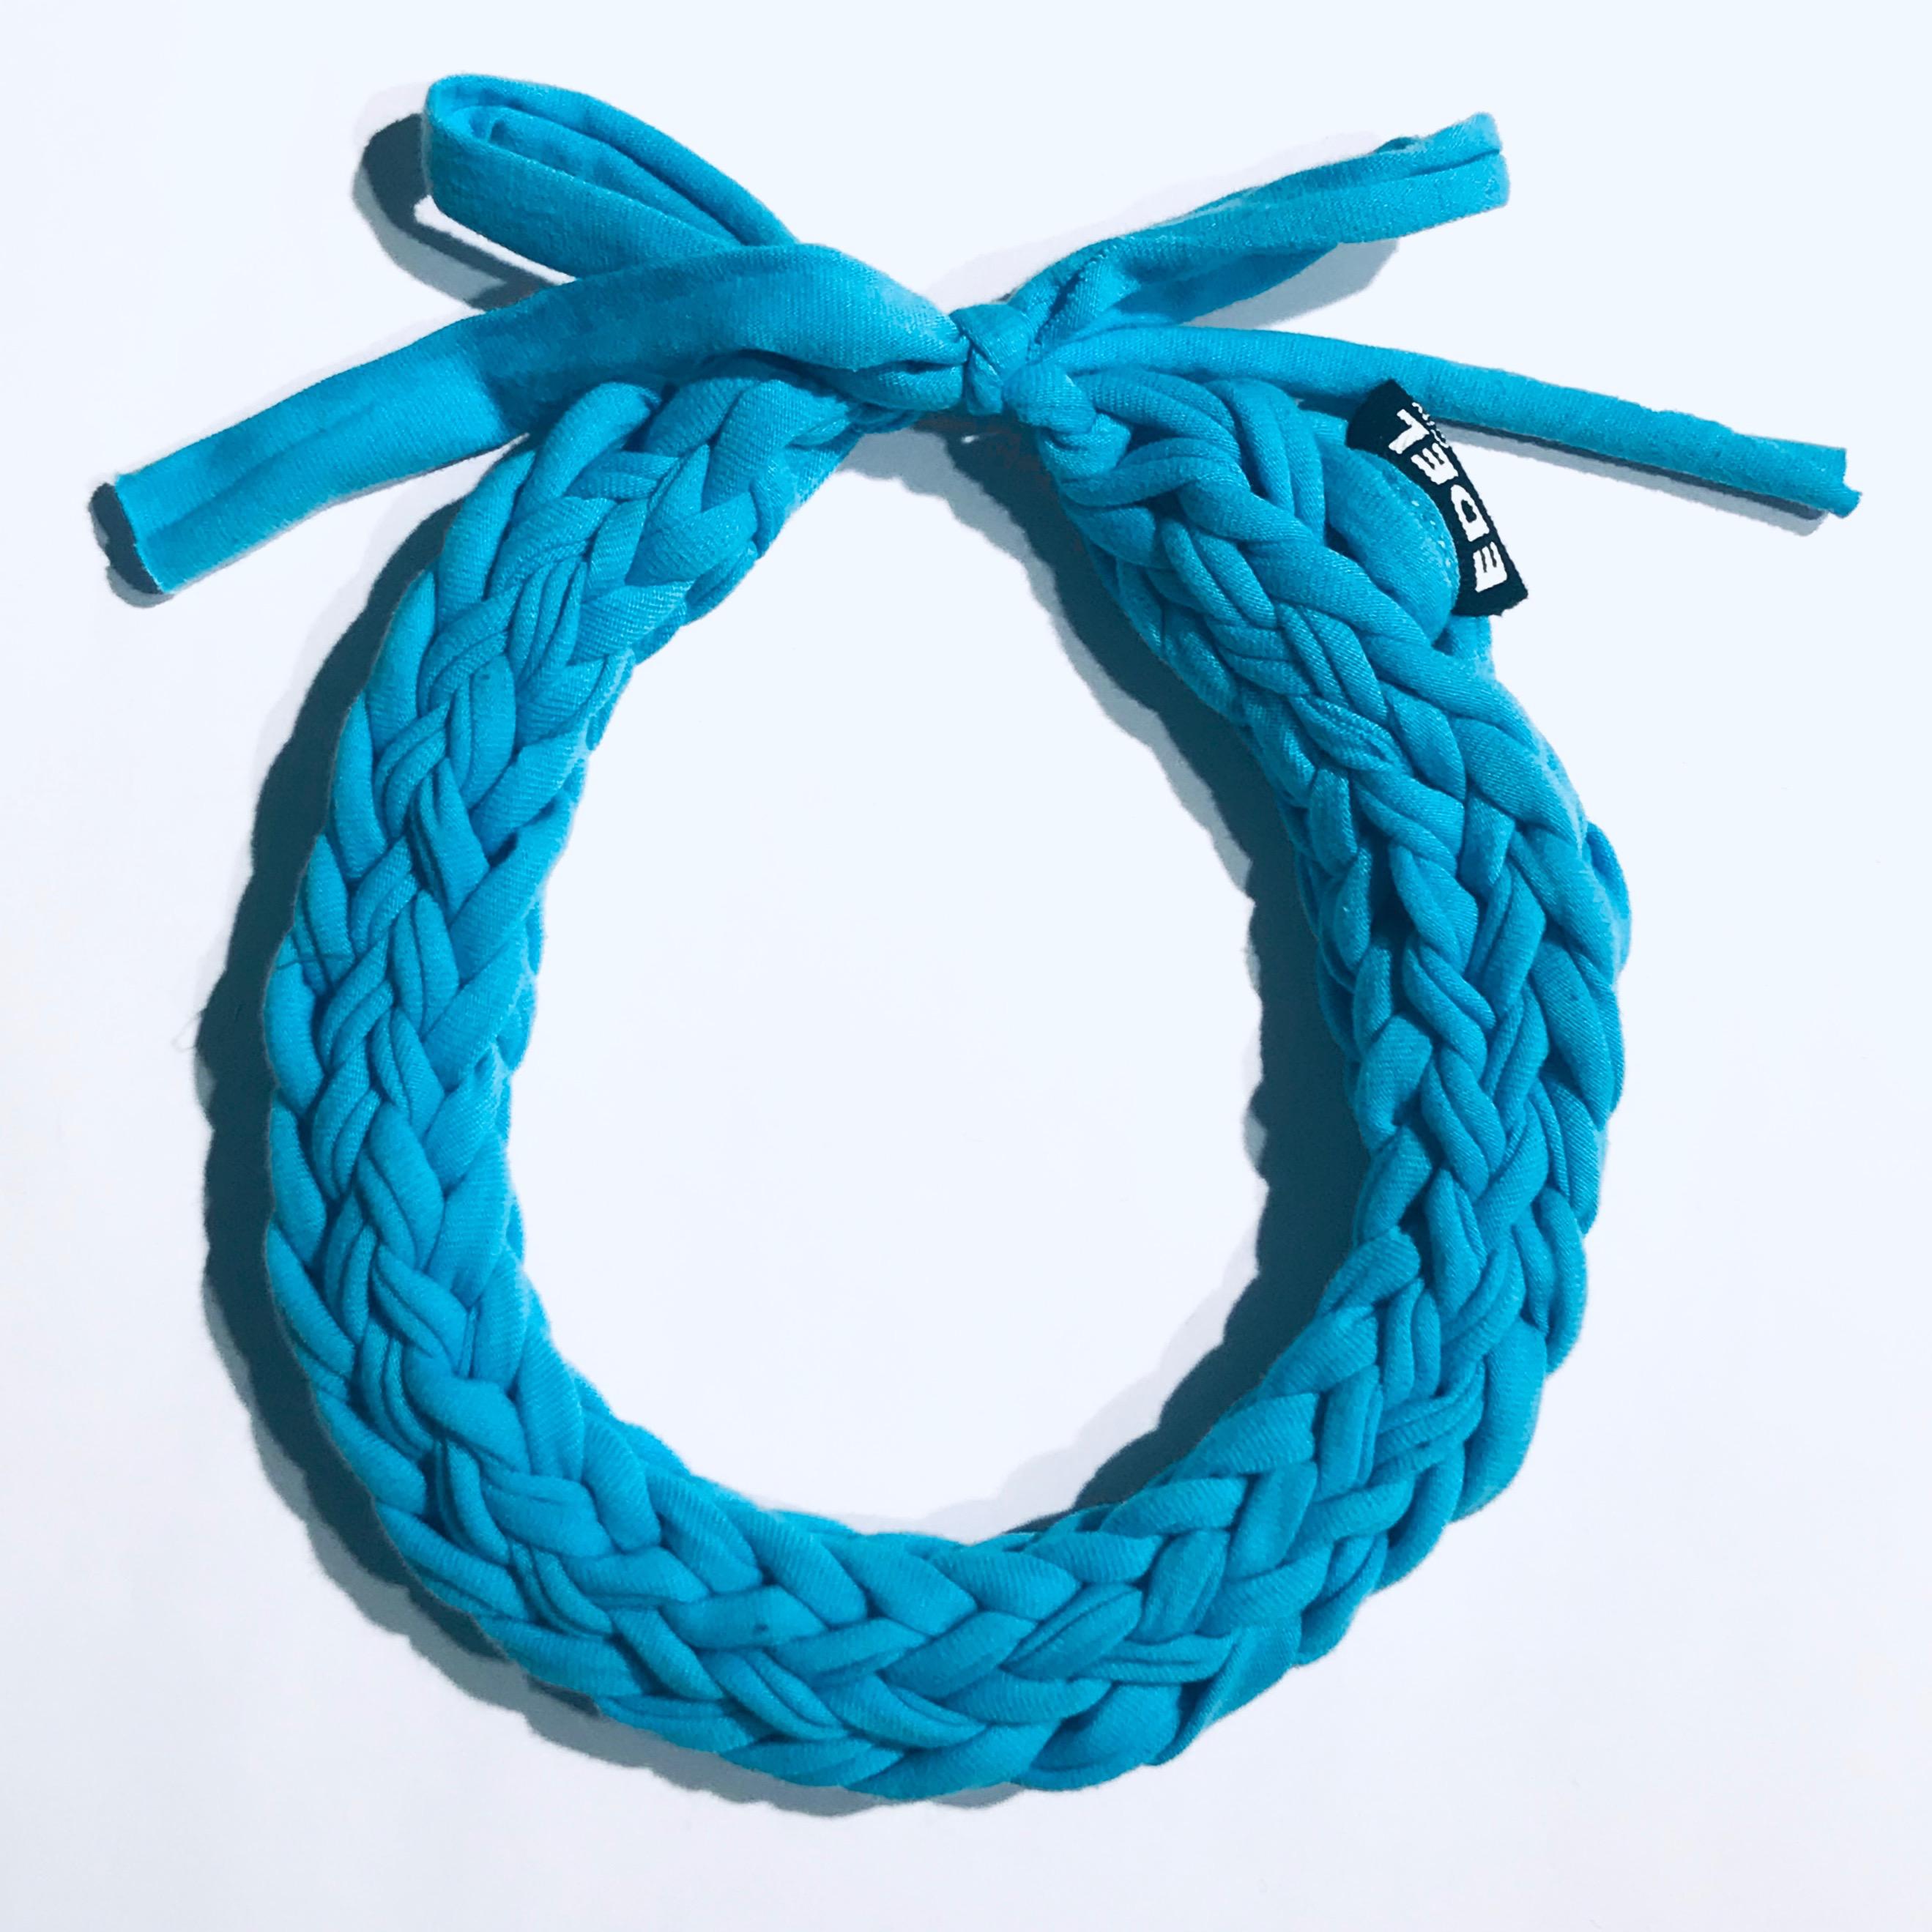 Phoenyx necklace